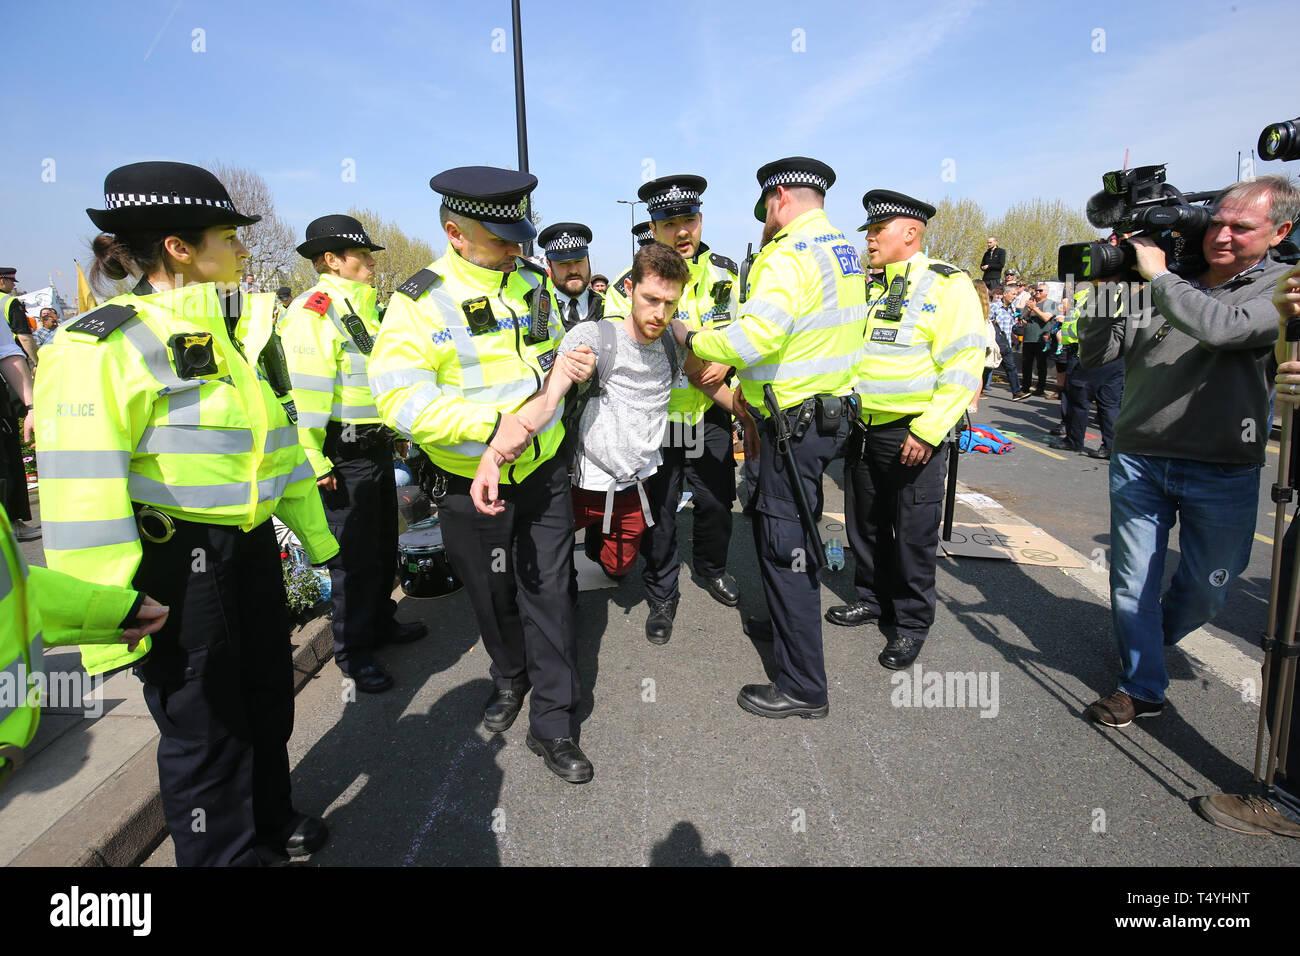 An Extinction Rebellion demonstrator is carried away by police on Waterloo Bridge in London. Stock Photo